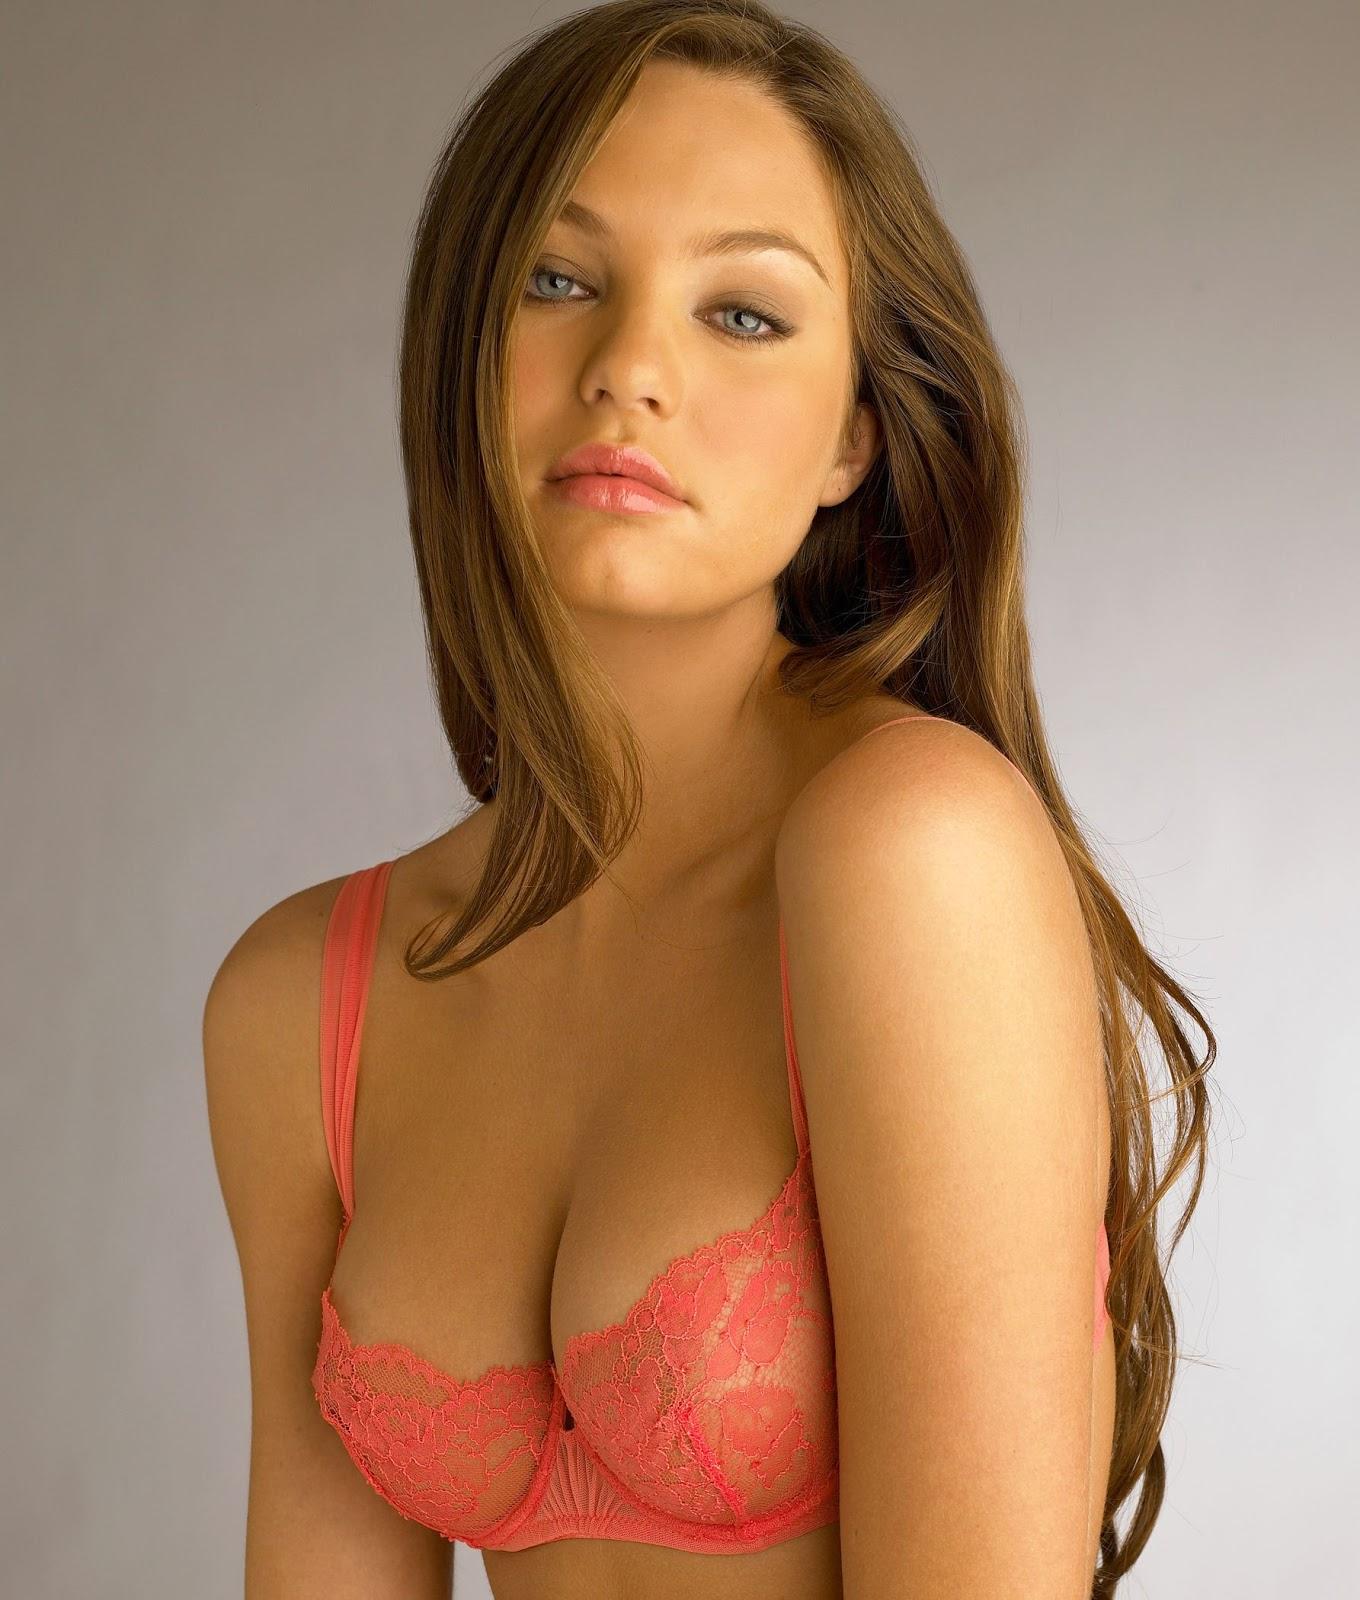 Hot amature lingerie models